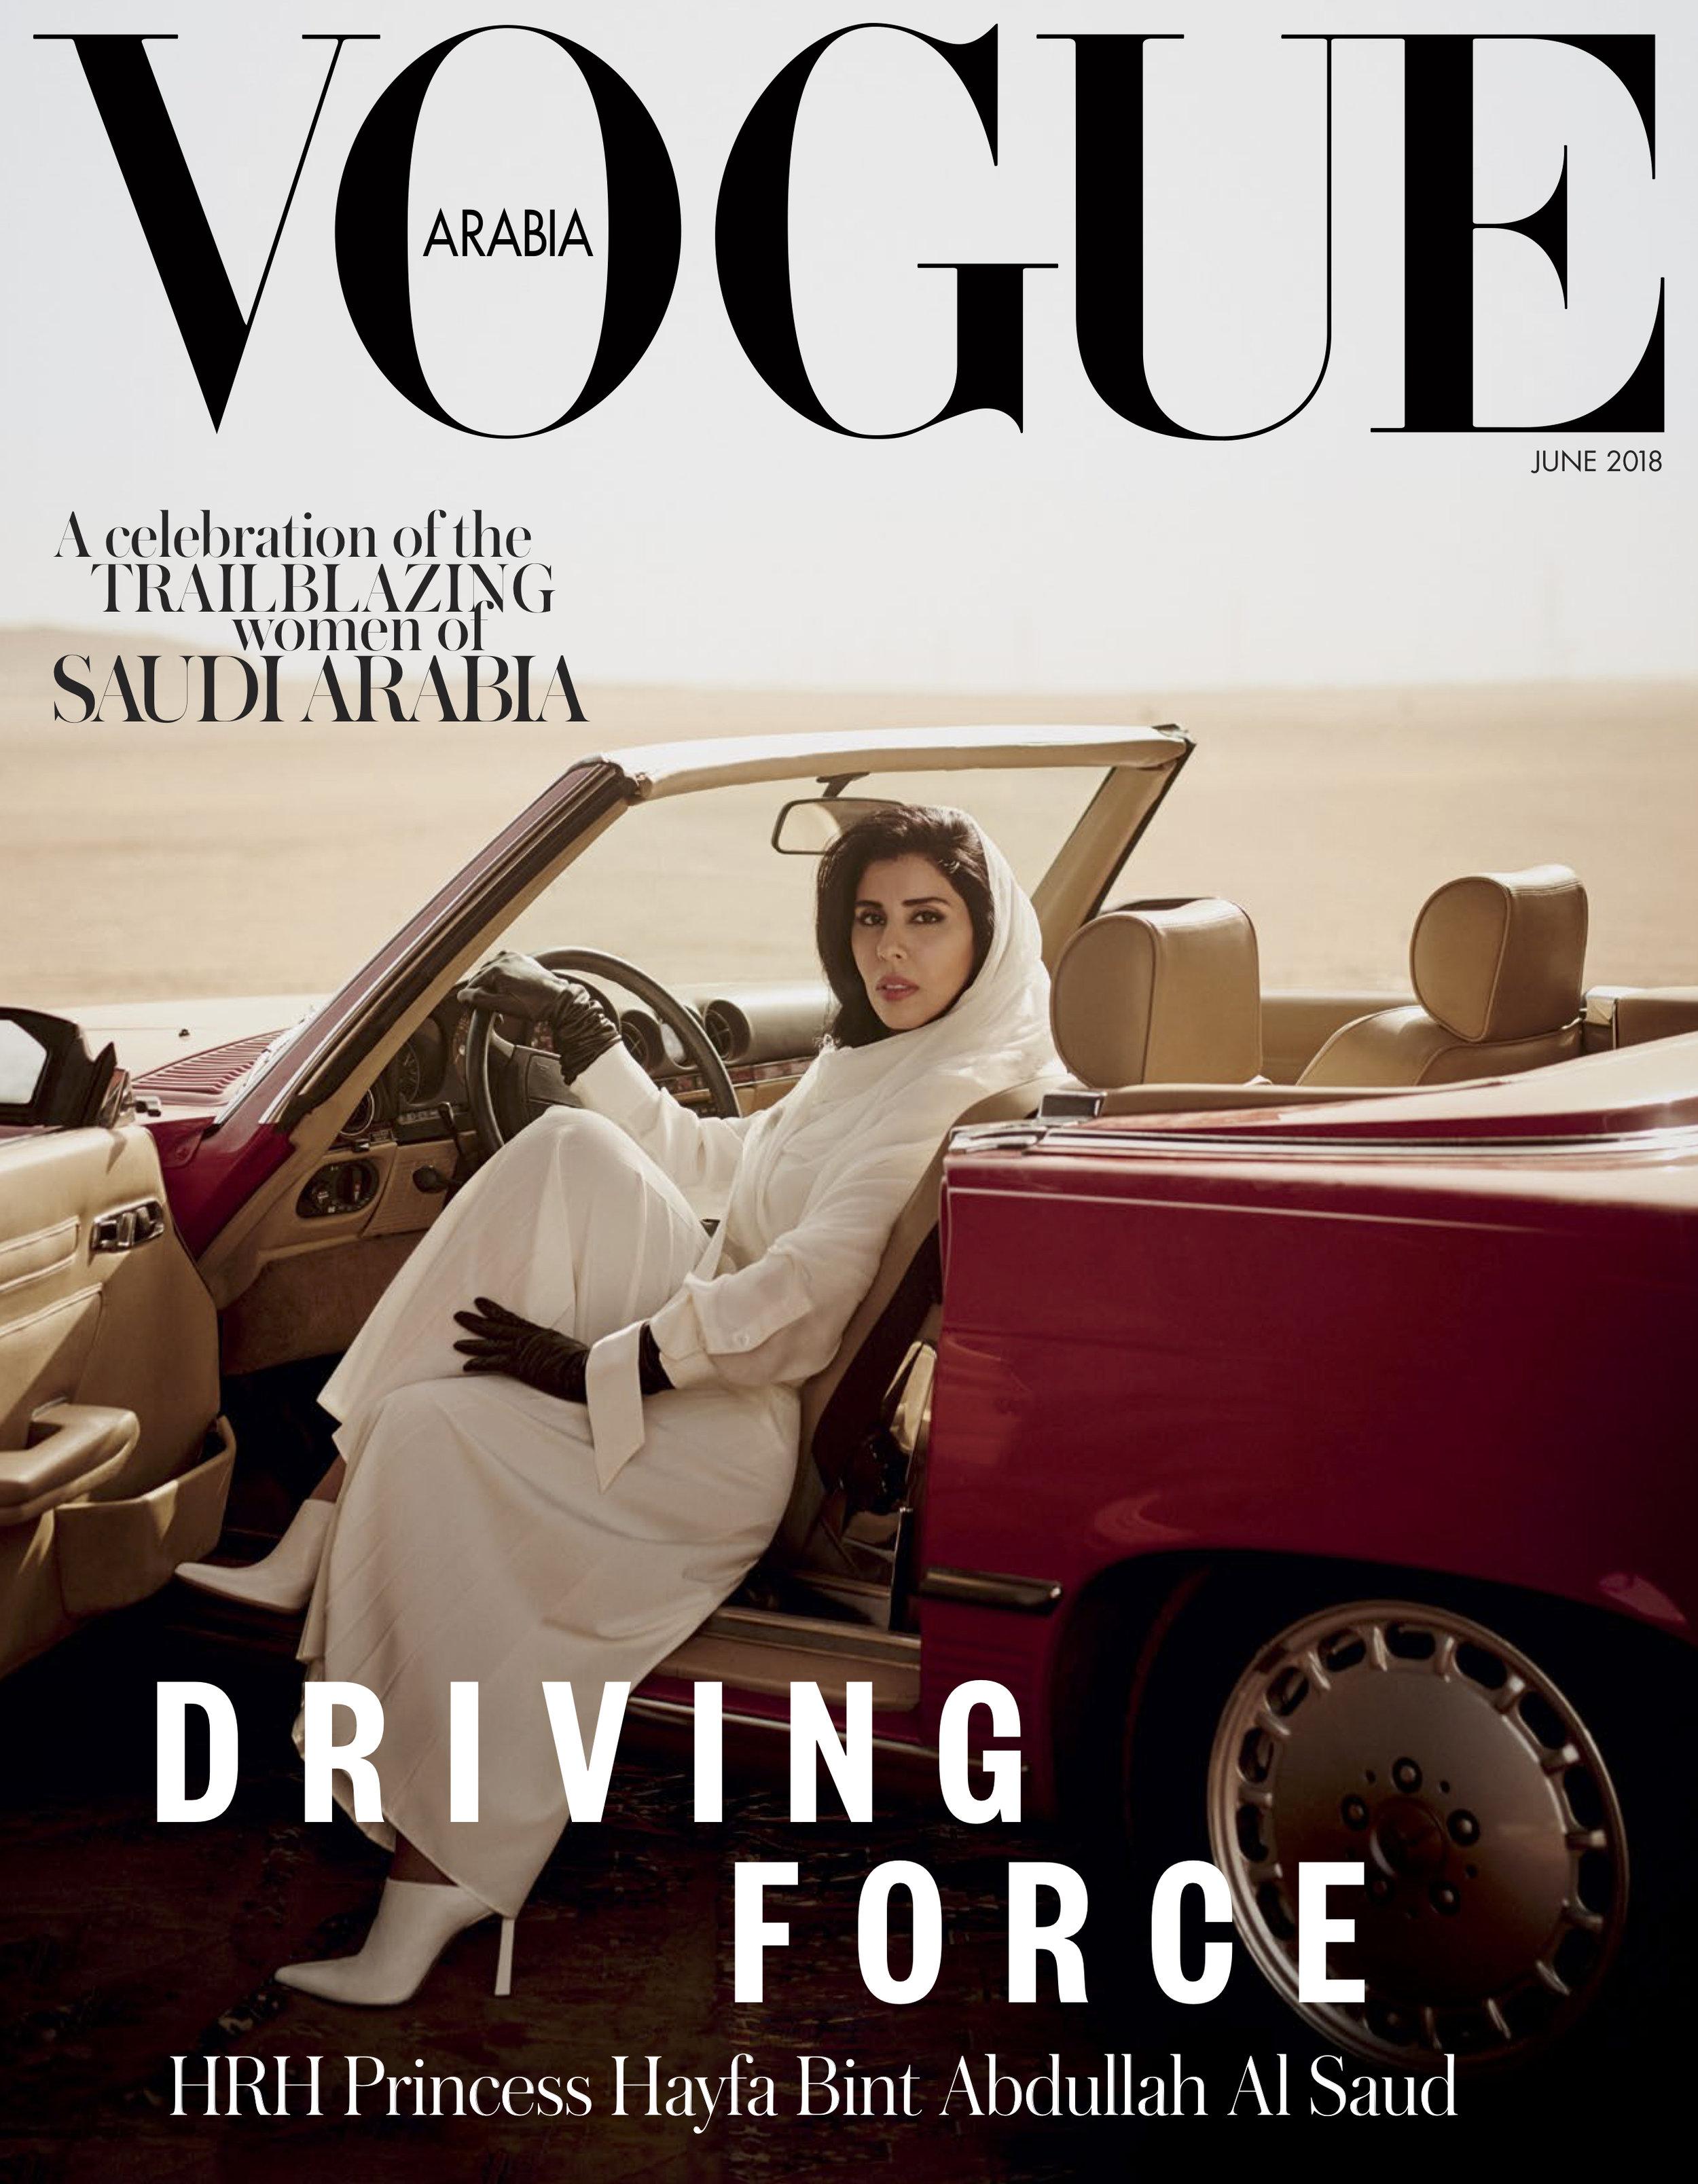 HRH Princess Hayfa Bint Abdullah Al Saud x Vogue Arabia